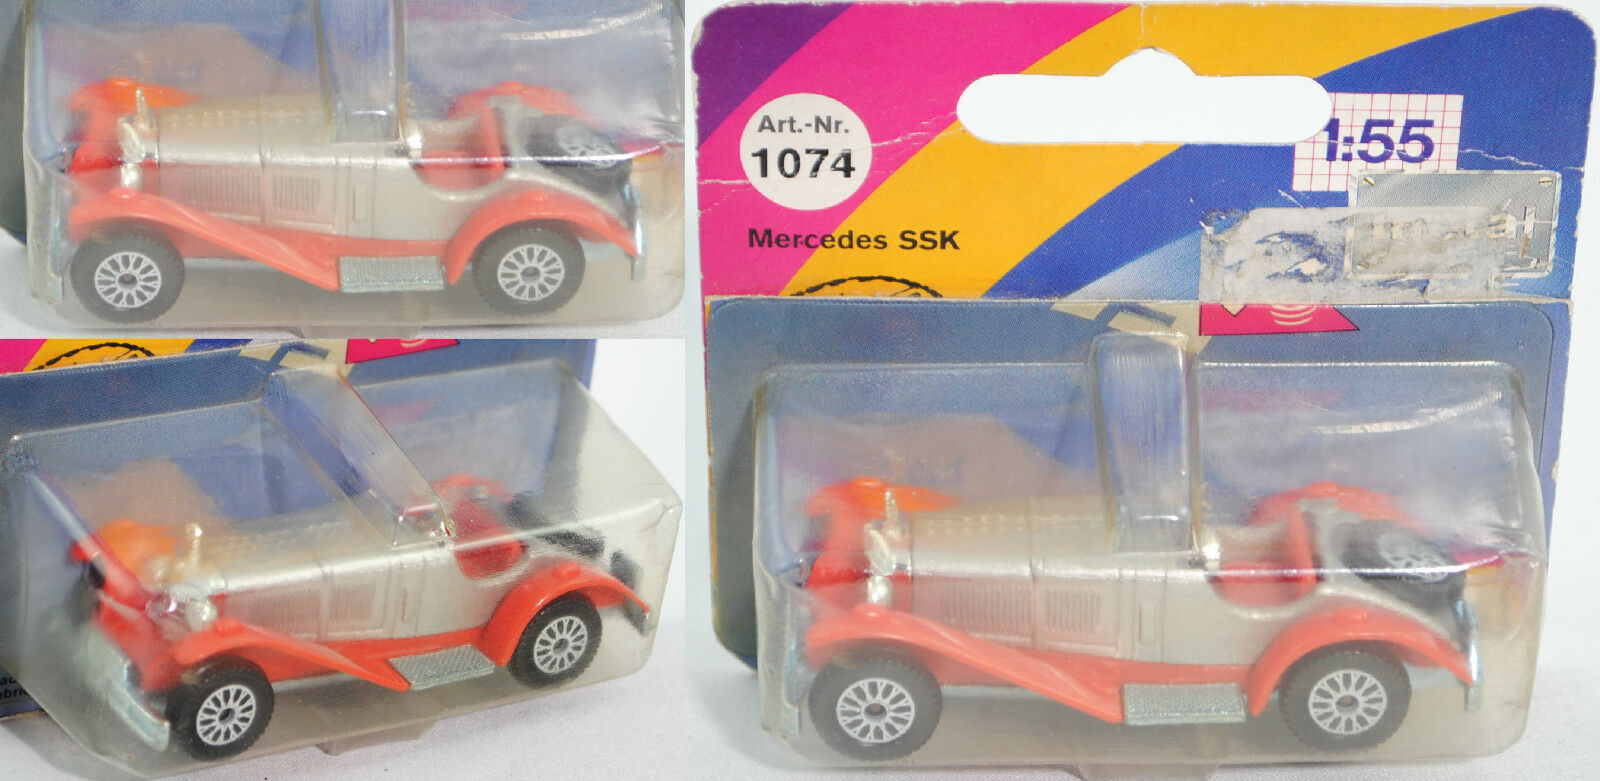 SIKU SUPER 1074 MERCEDES-BENZ MERCEDES-BENZ MERCEDES-BENZ SSK Type 27 (W 06 III) environ 1:55 bc6770